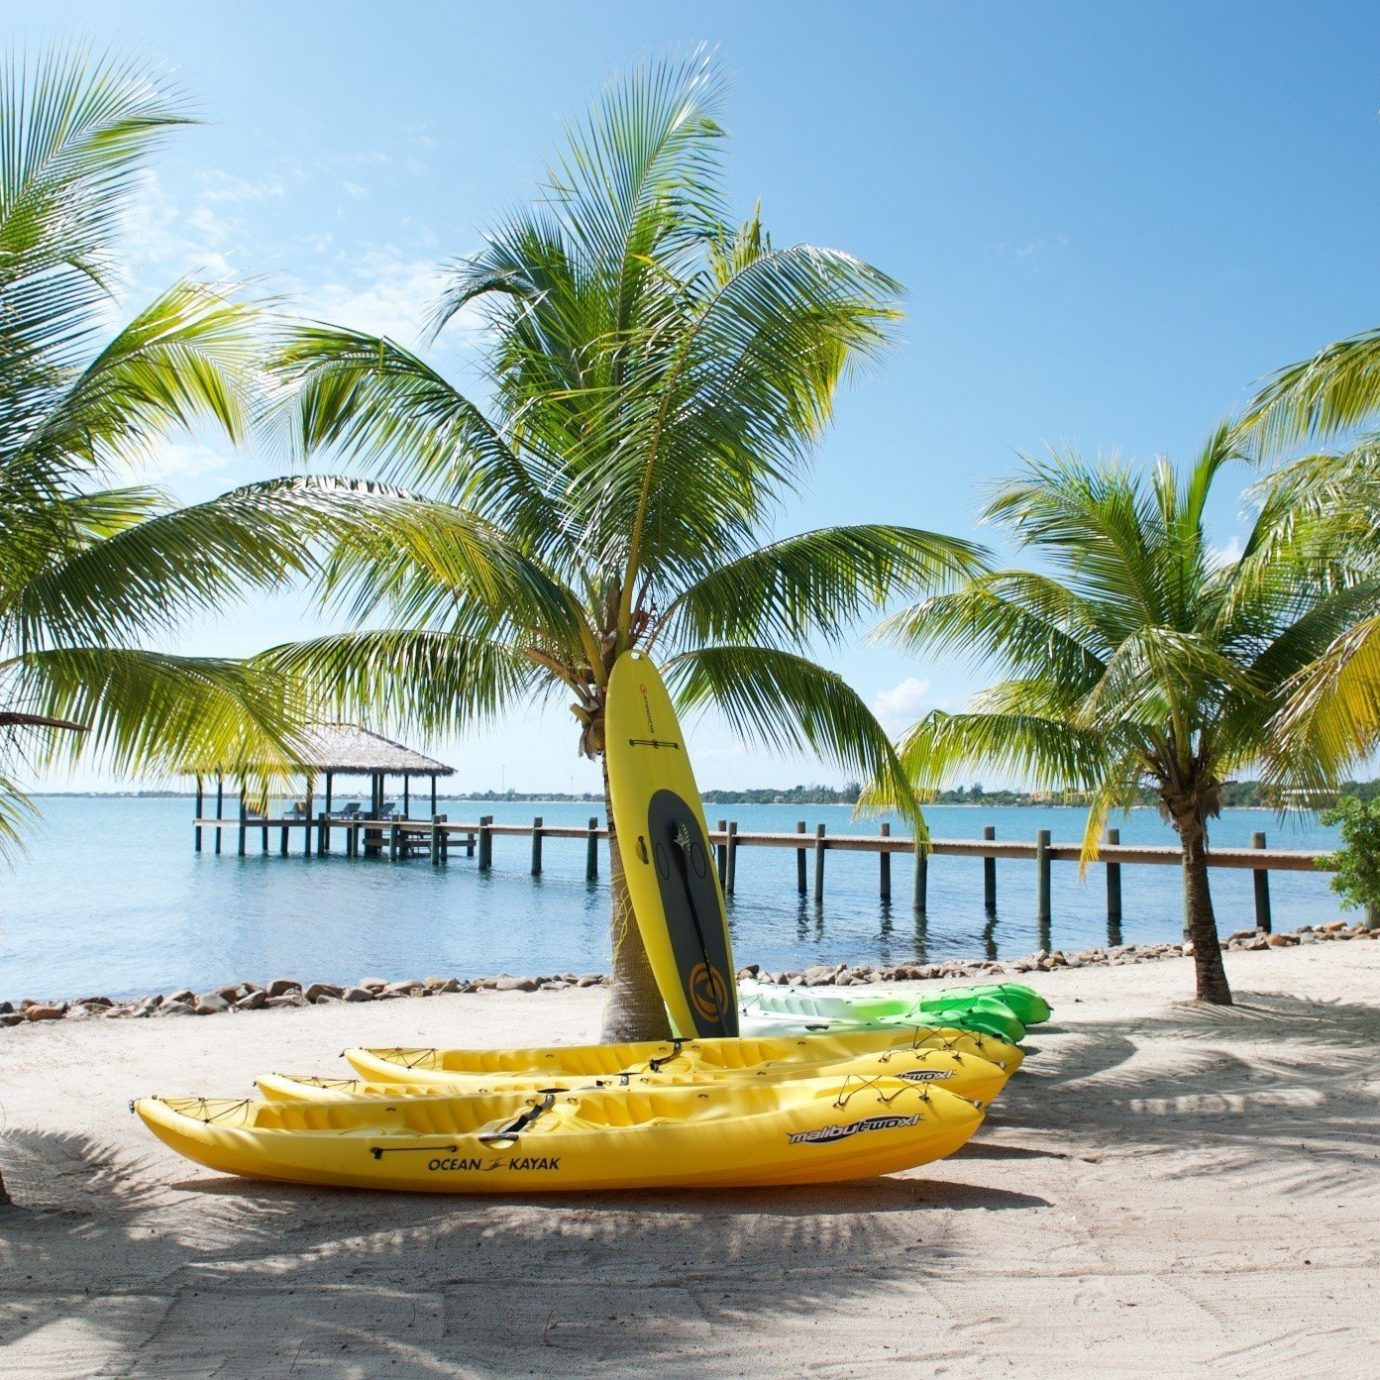 tree palm sky Beach palm family caribbean plant Resort tropics arecales woody plant Pool Sea sandy